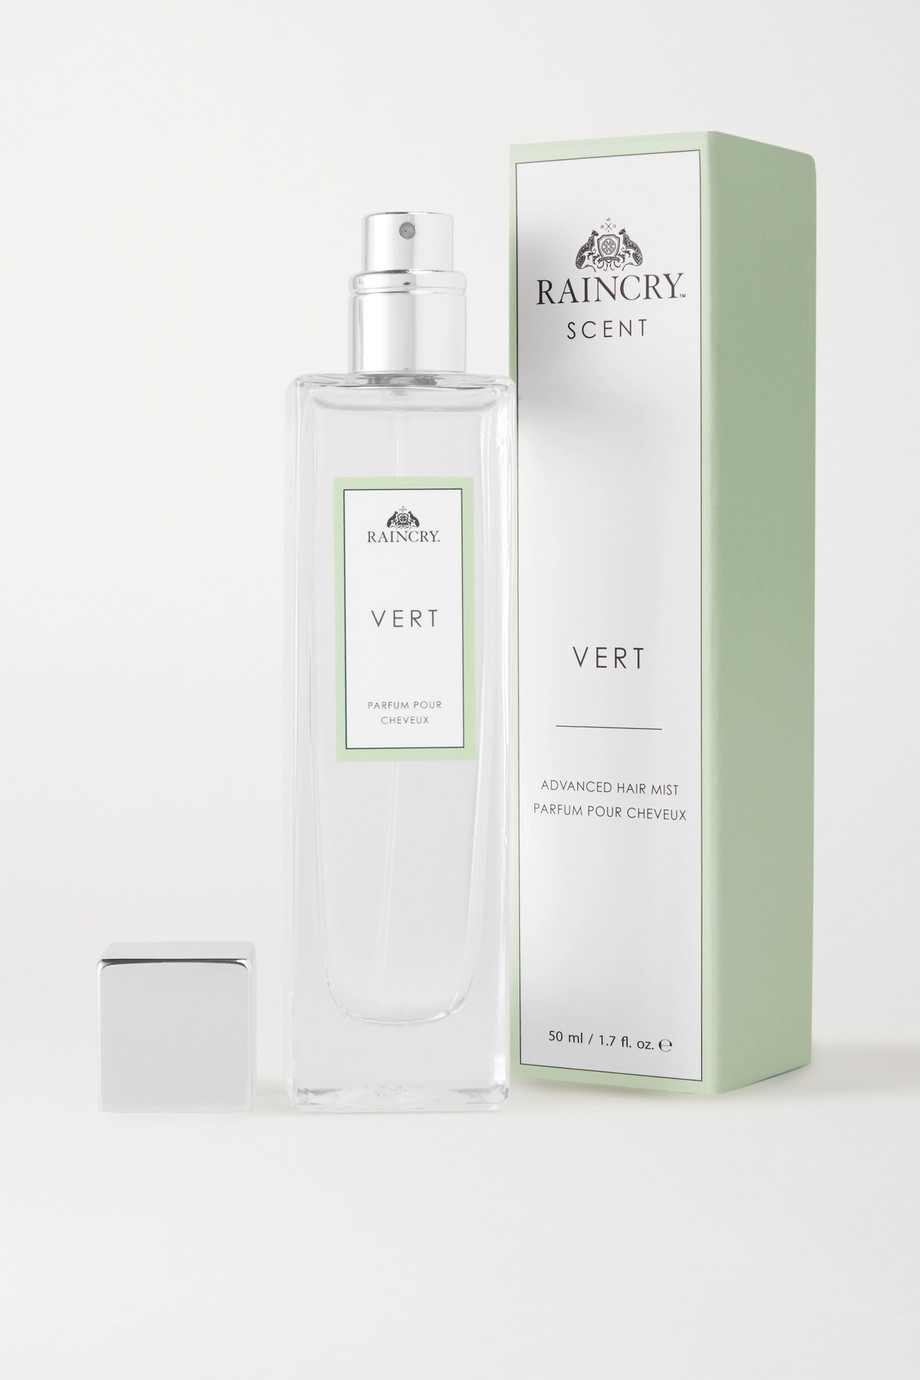 RAINCRY Advanced Hair Mist Vert - Rose Dew Provence, 50ml